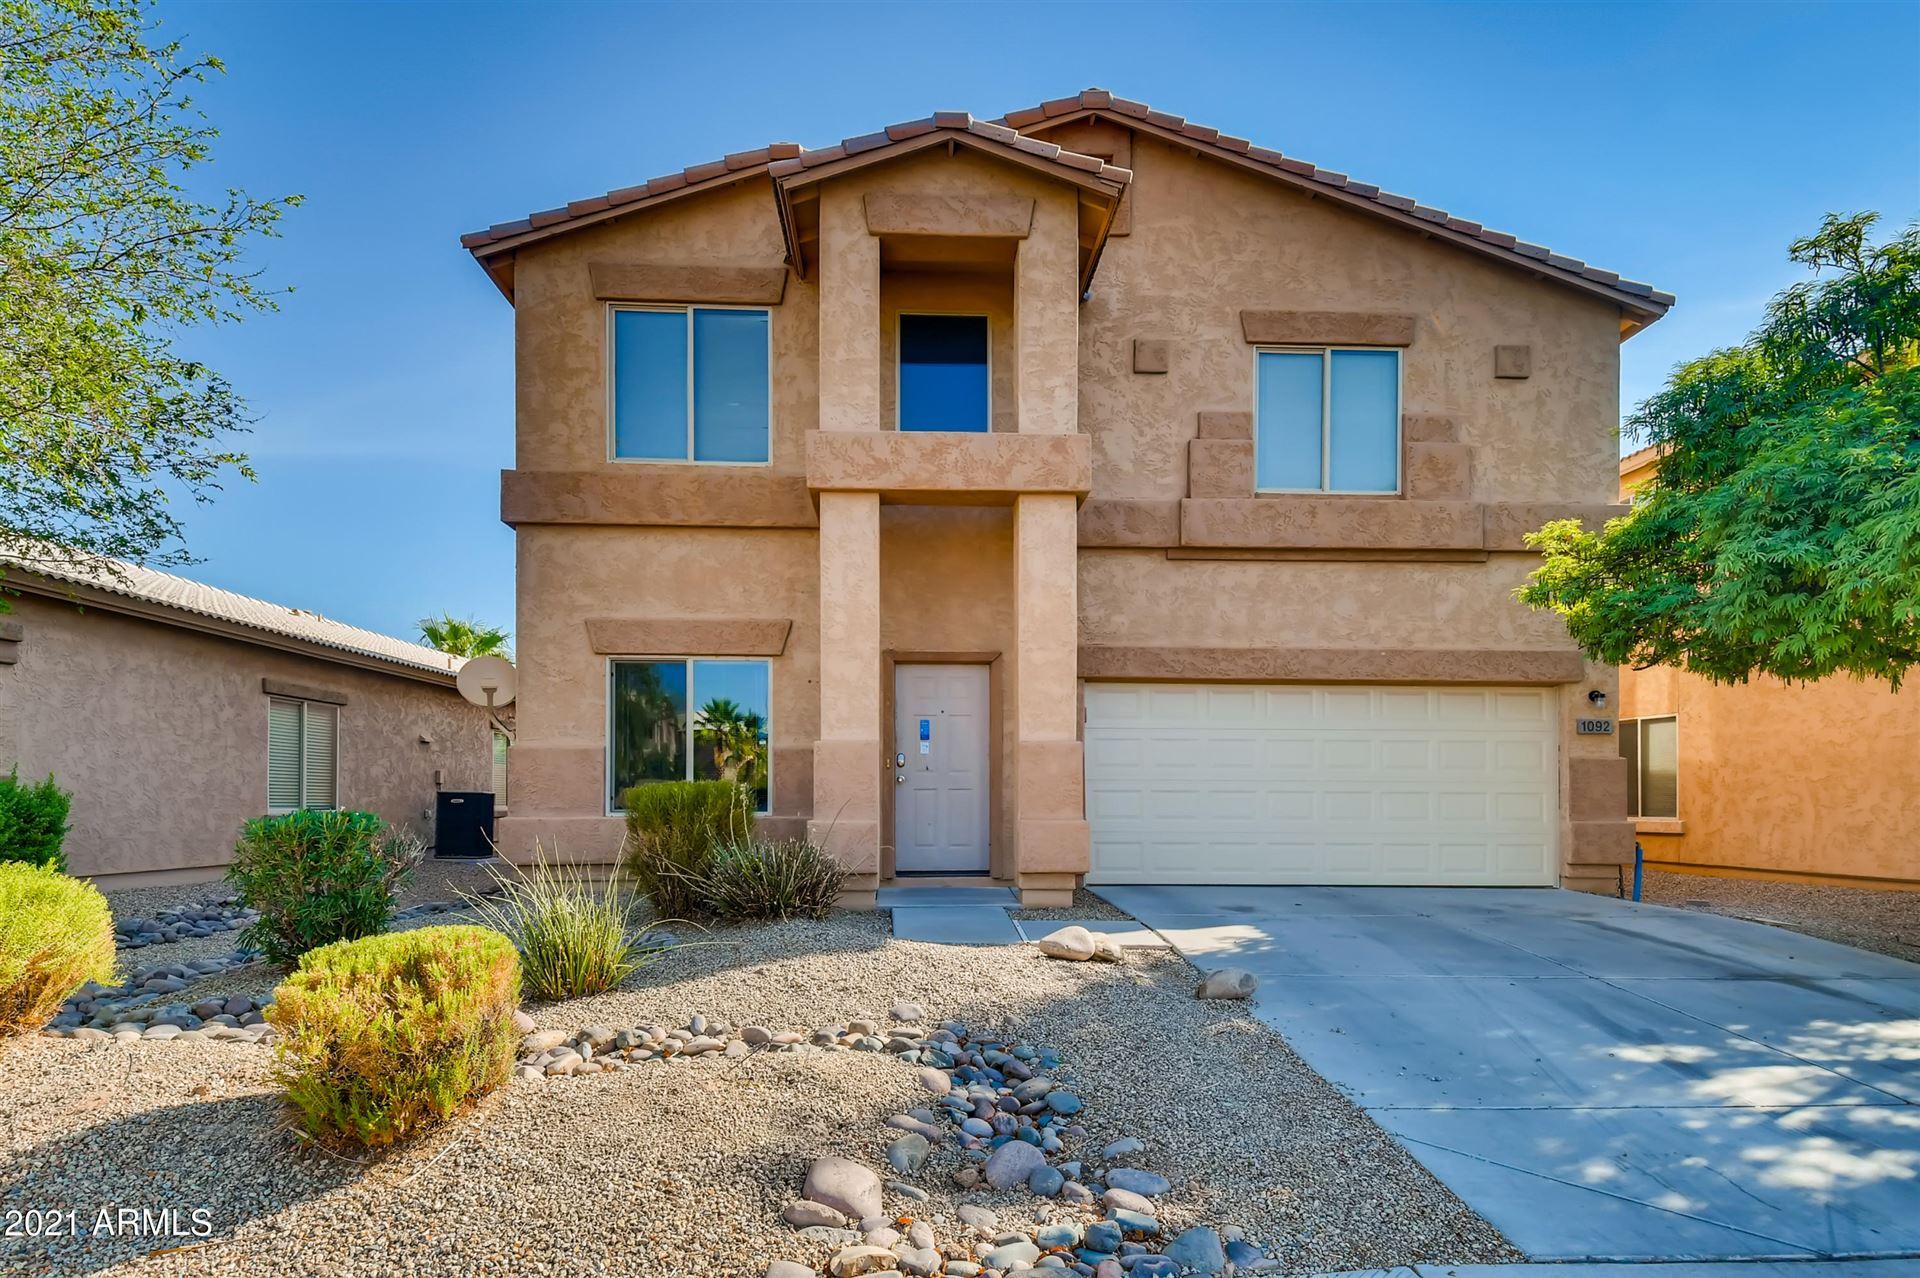 1092 E DESERT SPRINGS Way, San Tan Valley, AZ 85143 - MLS#: 6261588